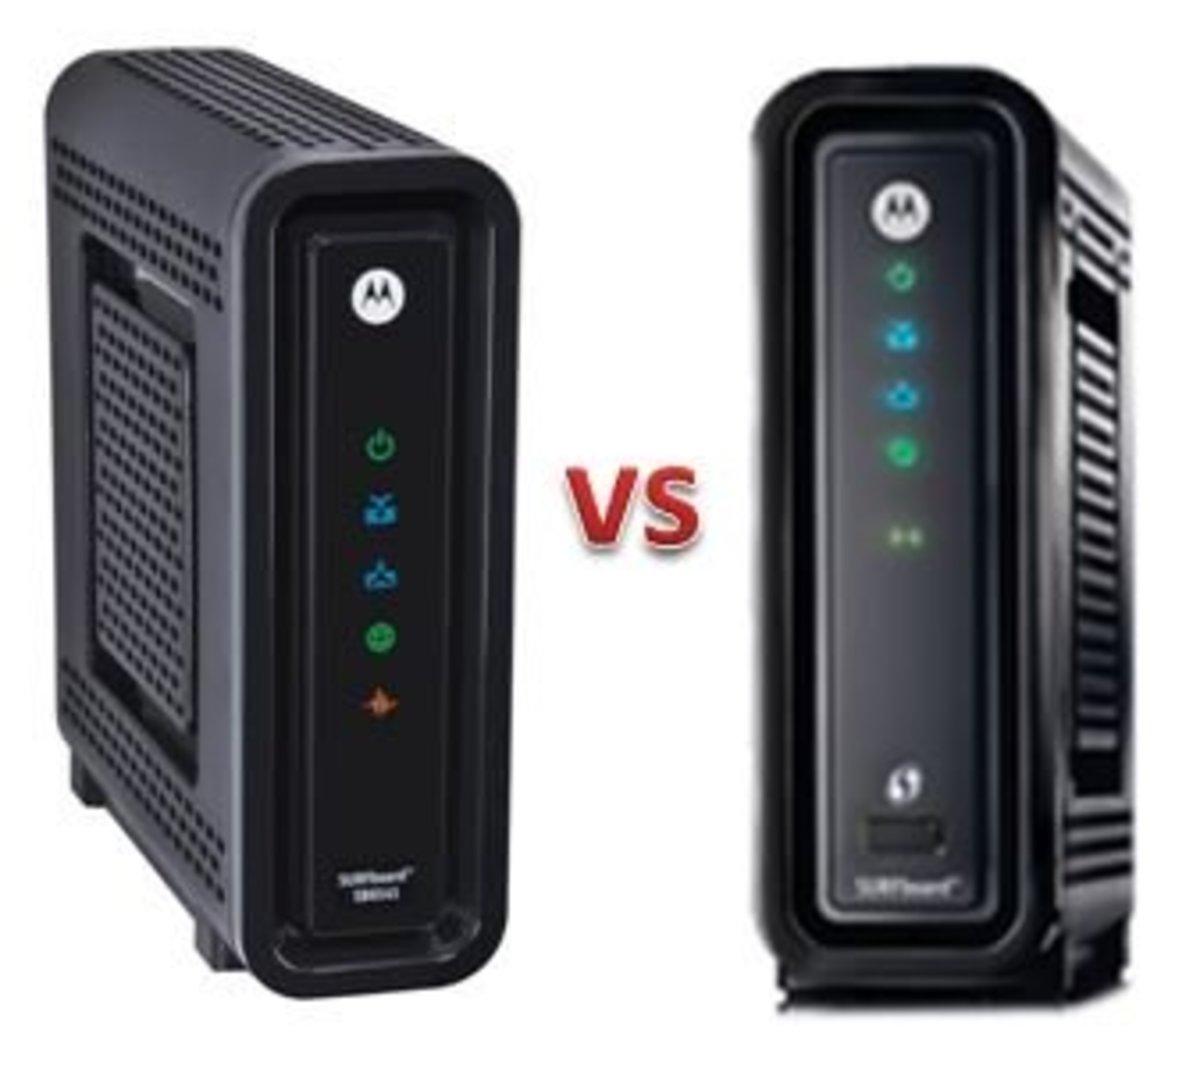 Arris Motorola SB6141 vs SBG6580: Which Is Better?